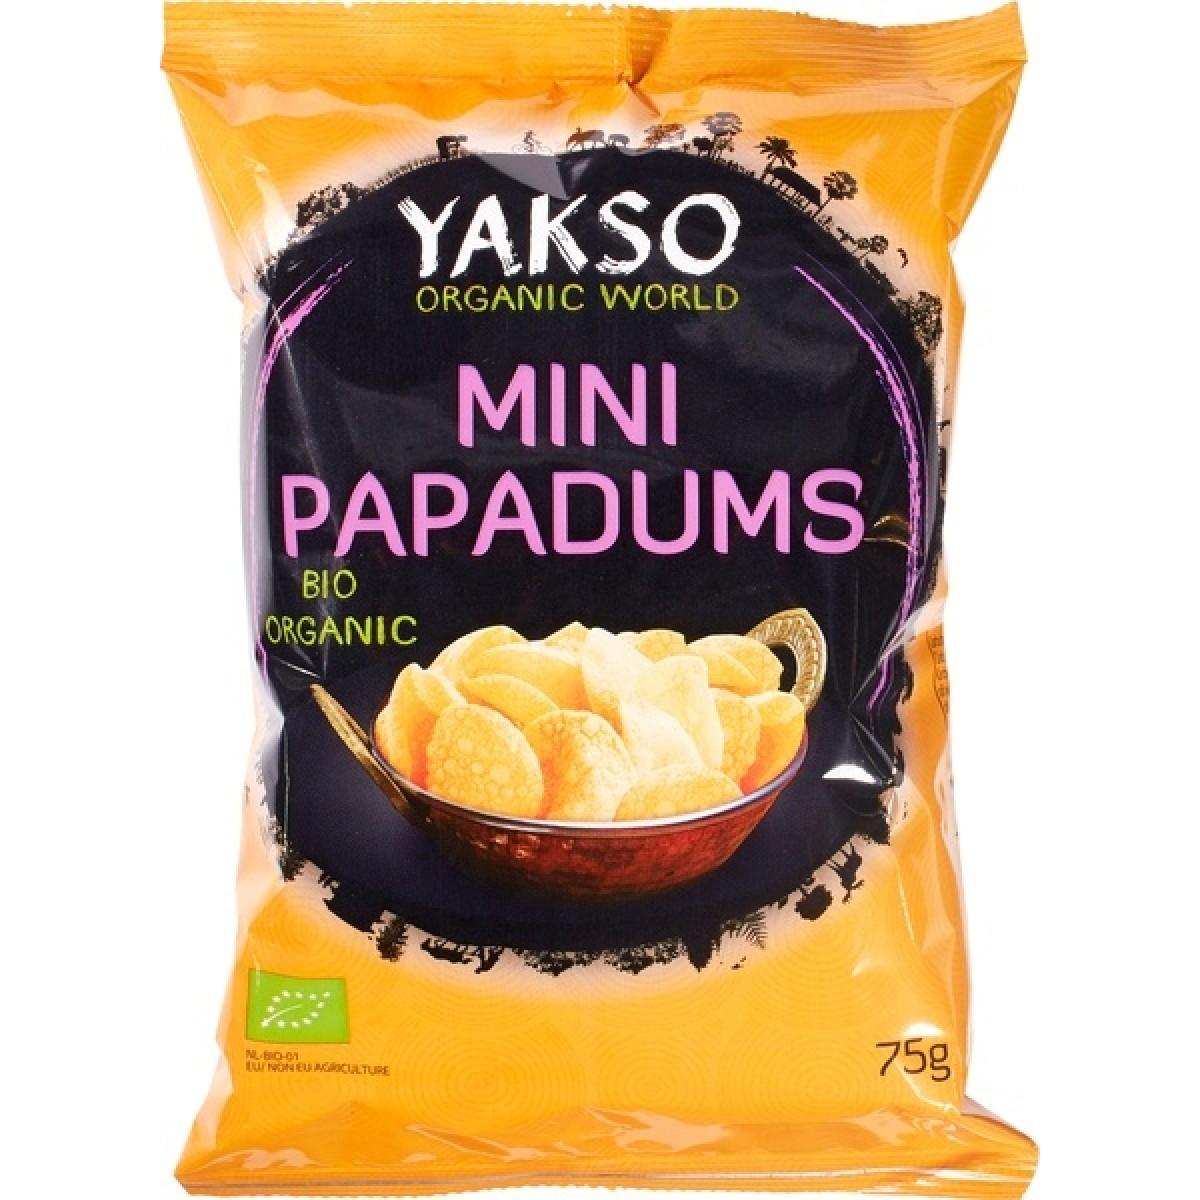 Mini Papadums